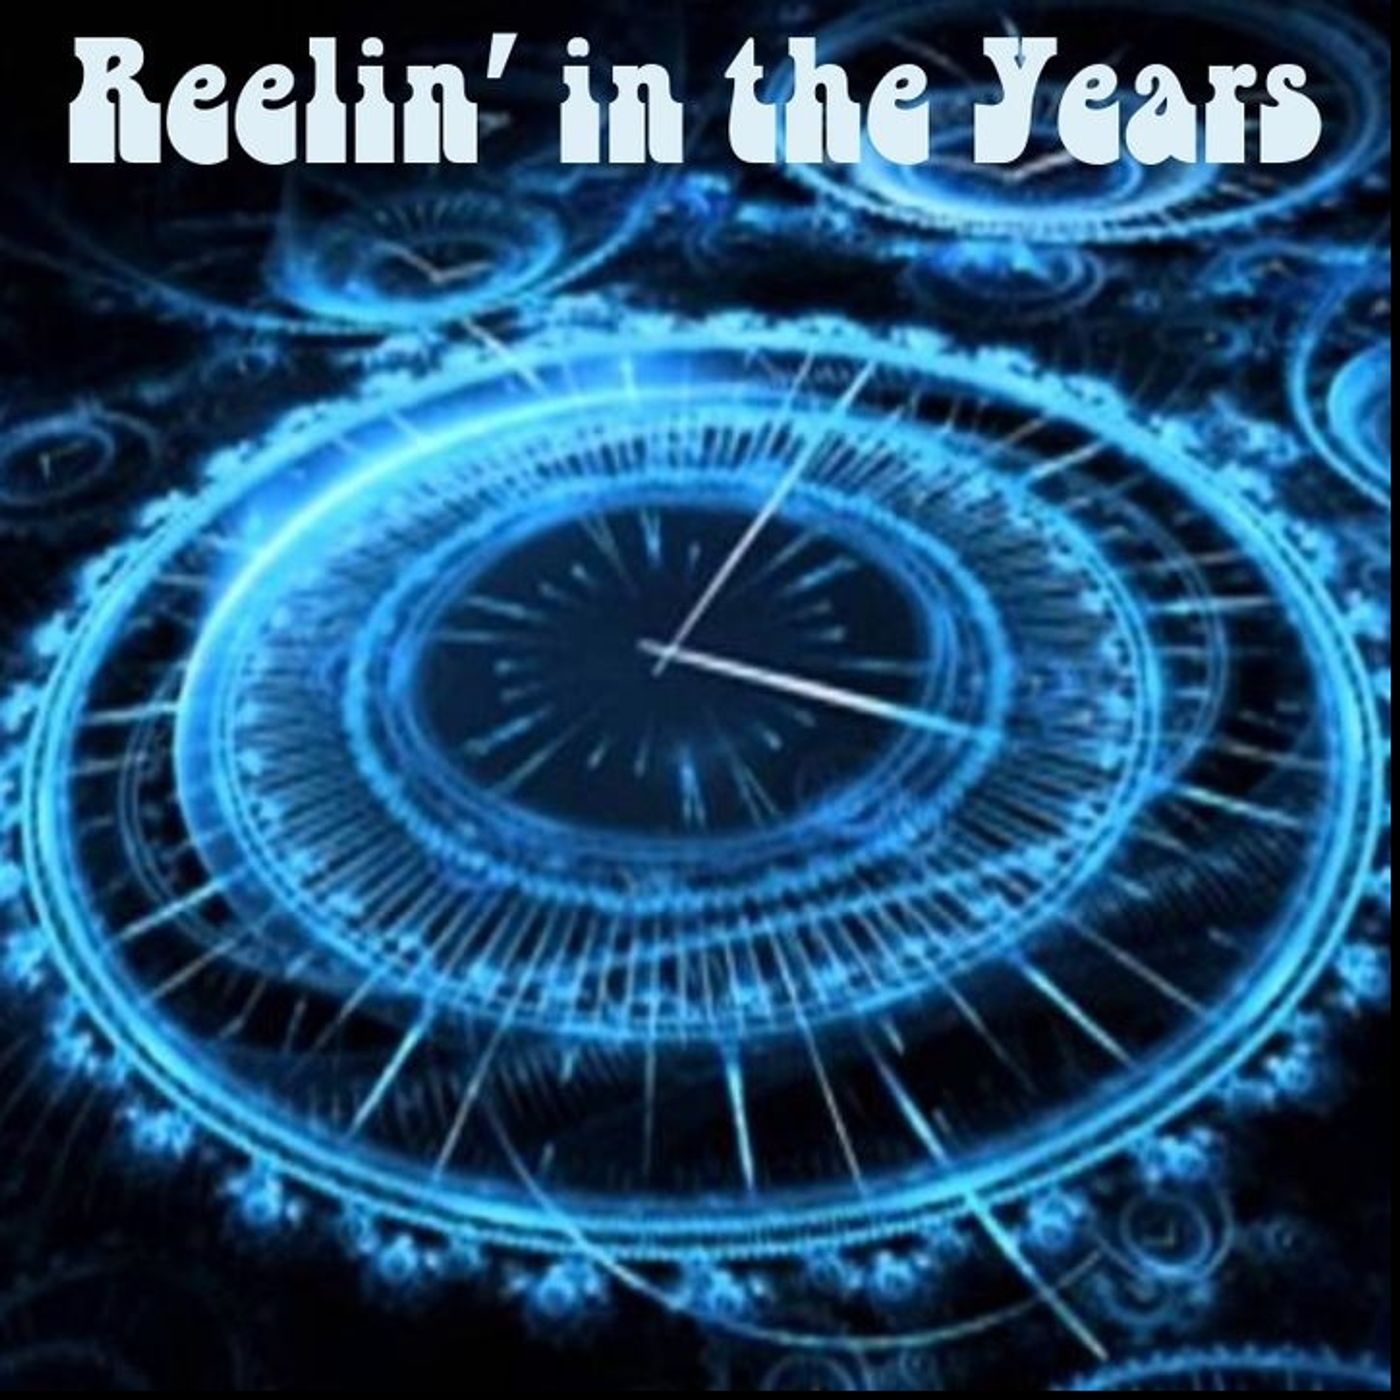 Reelin' Aug 4th, 1979